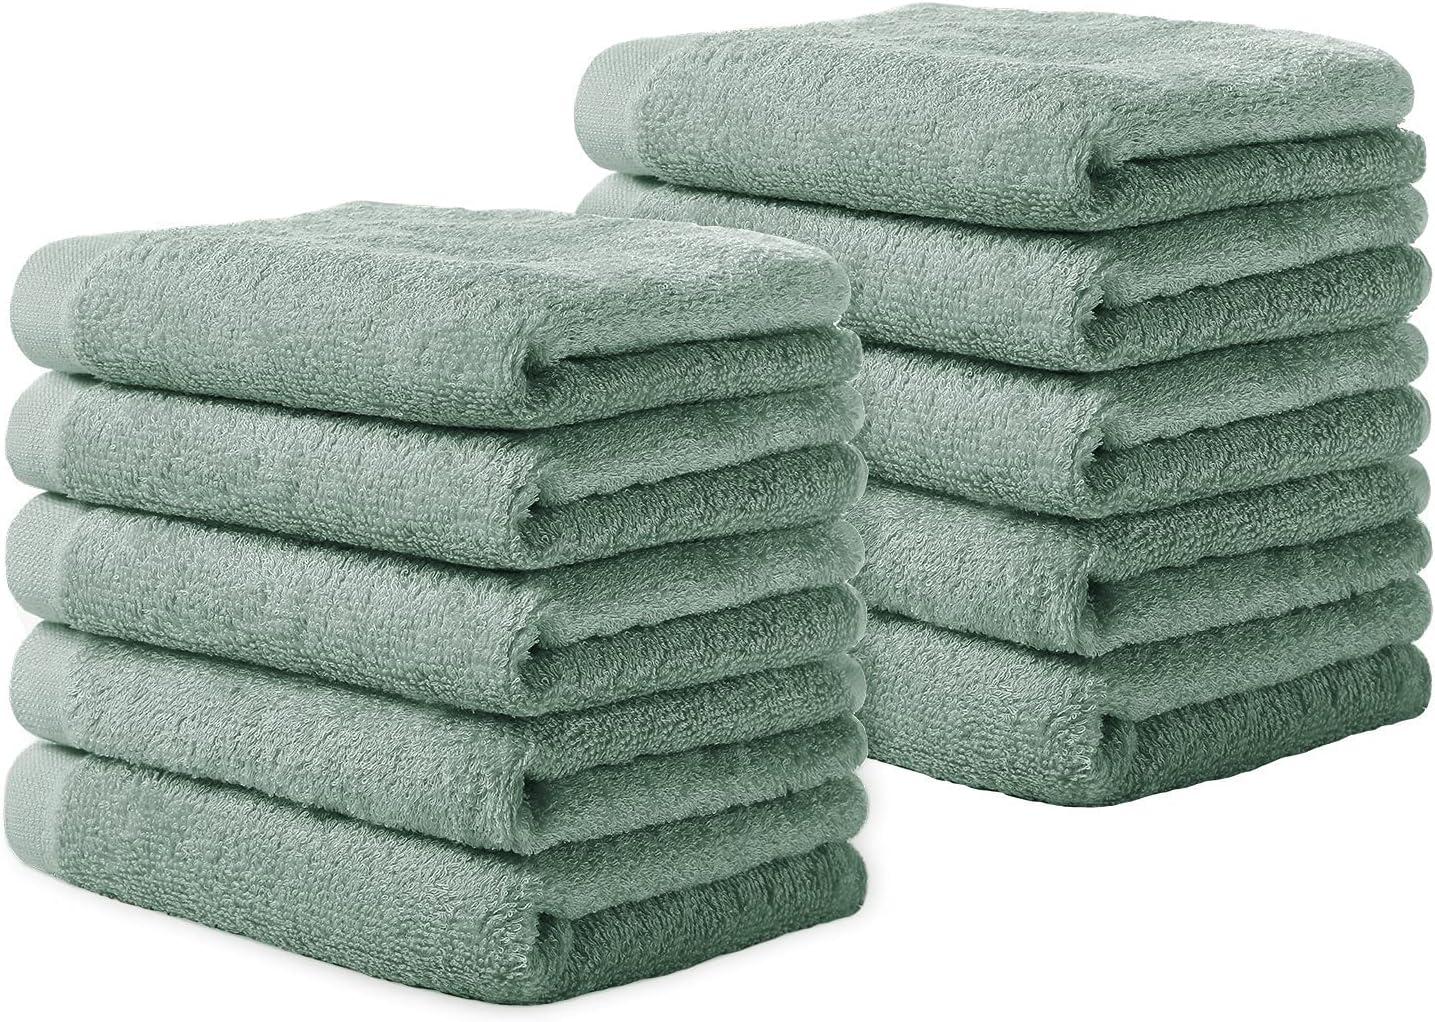 Yoofoss Luxury safety Bamboo Washcloths Towel Set Rare 10 Clo Pack Baby Wash